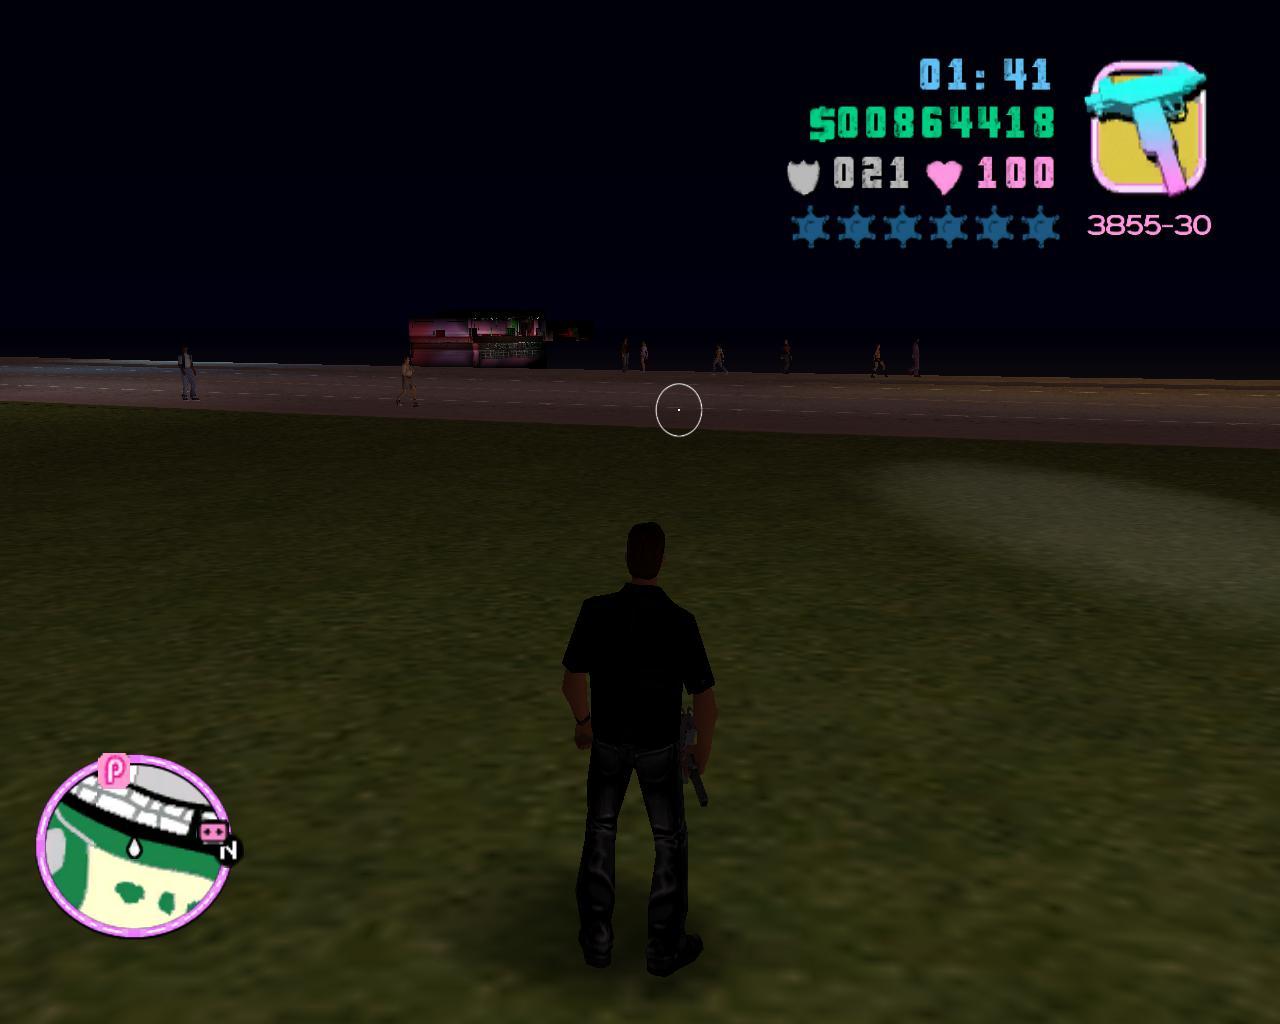 Глюк3 - Grand Theft Auto: Vice City Баг